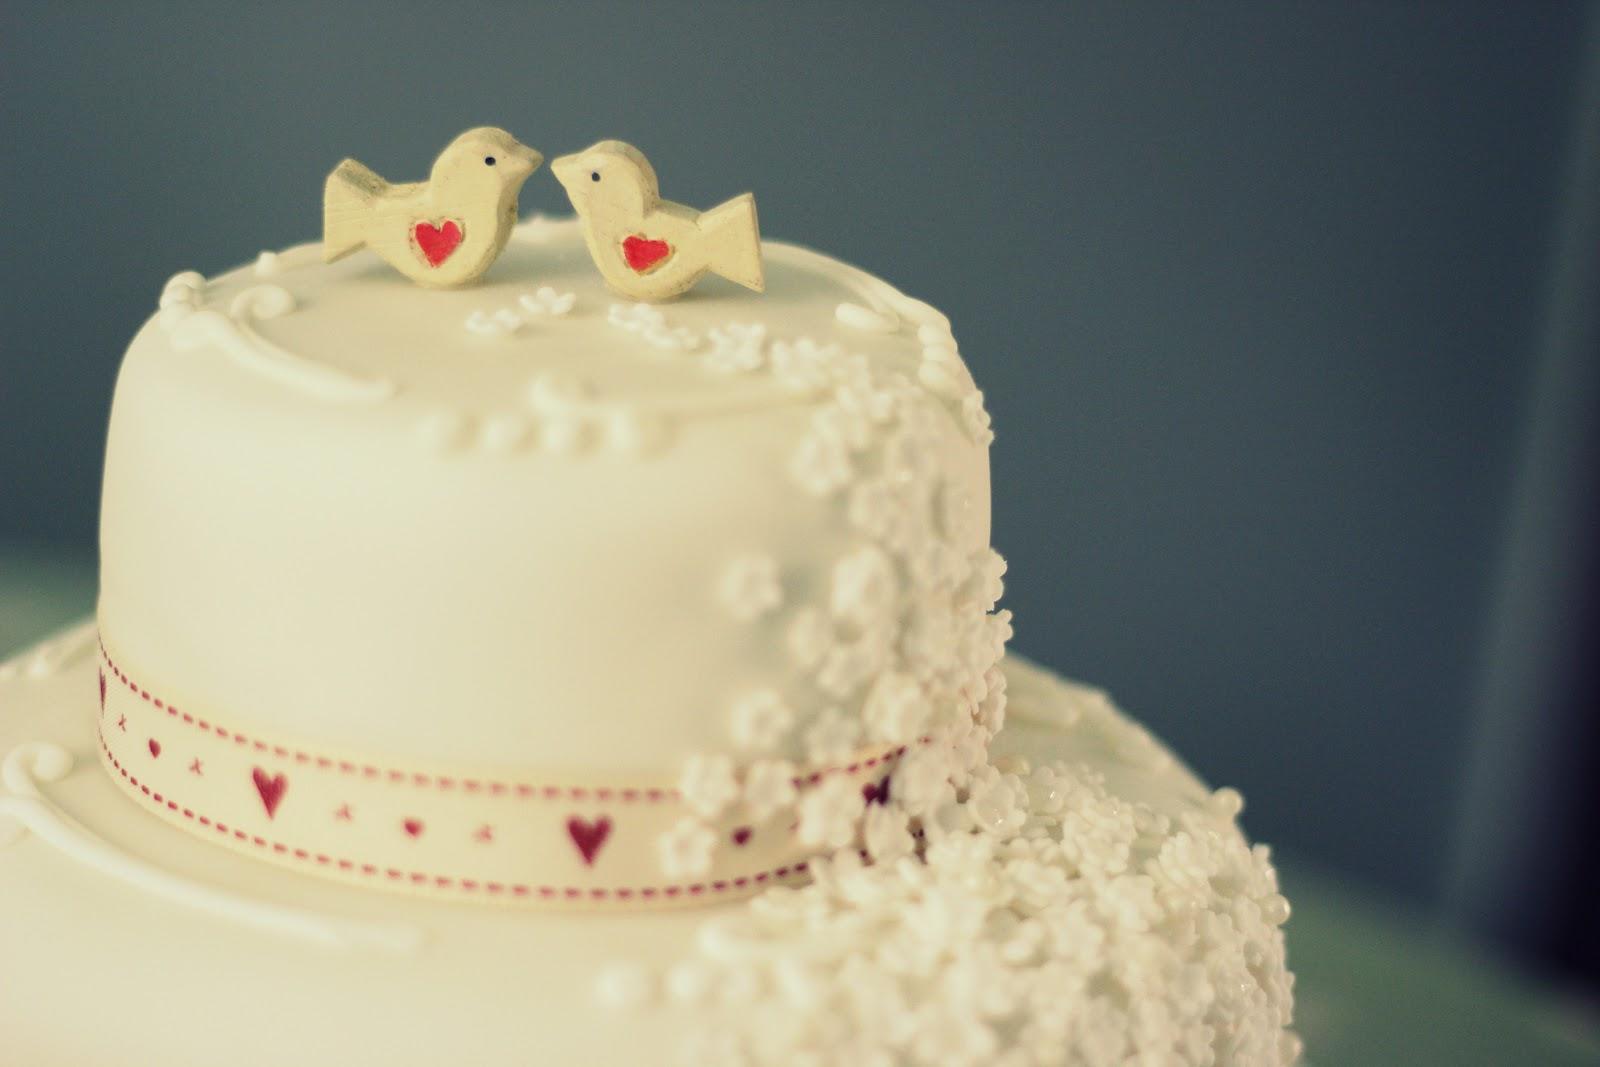 LOVE BIRDS WEDDING CAKE | ARINA TOTTENHAM-SMITH